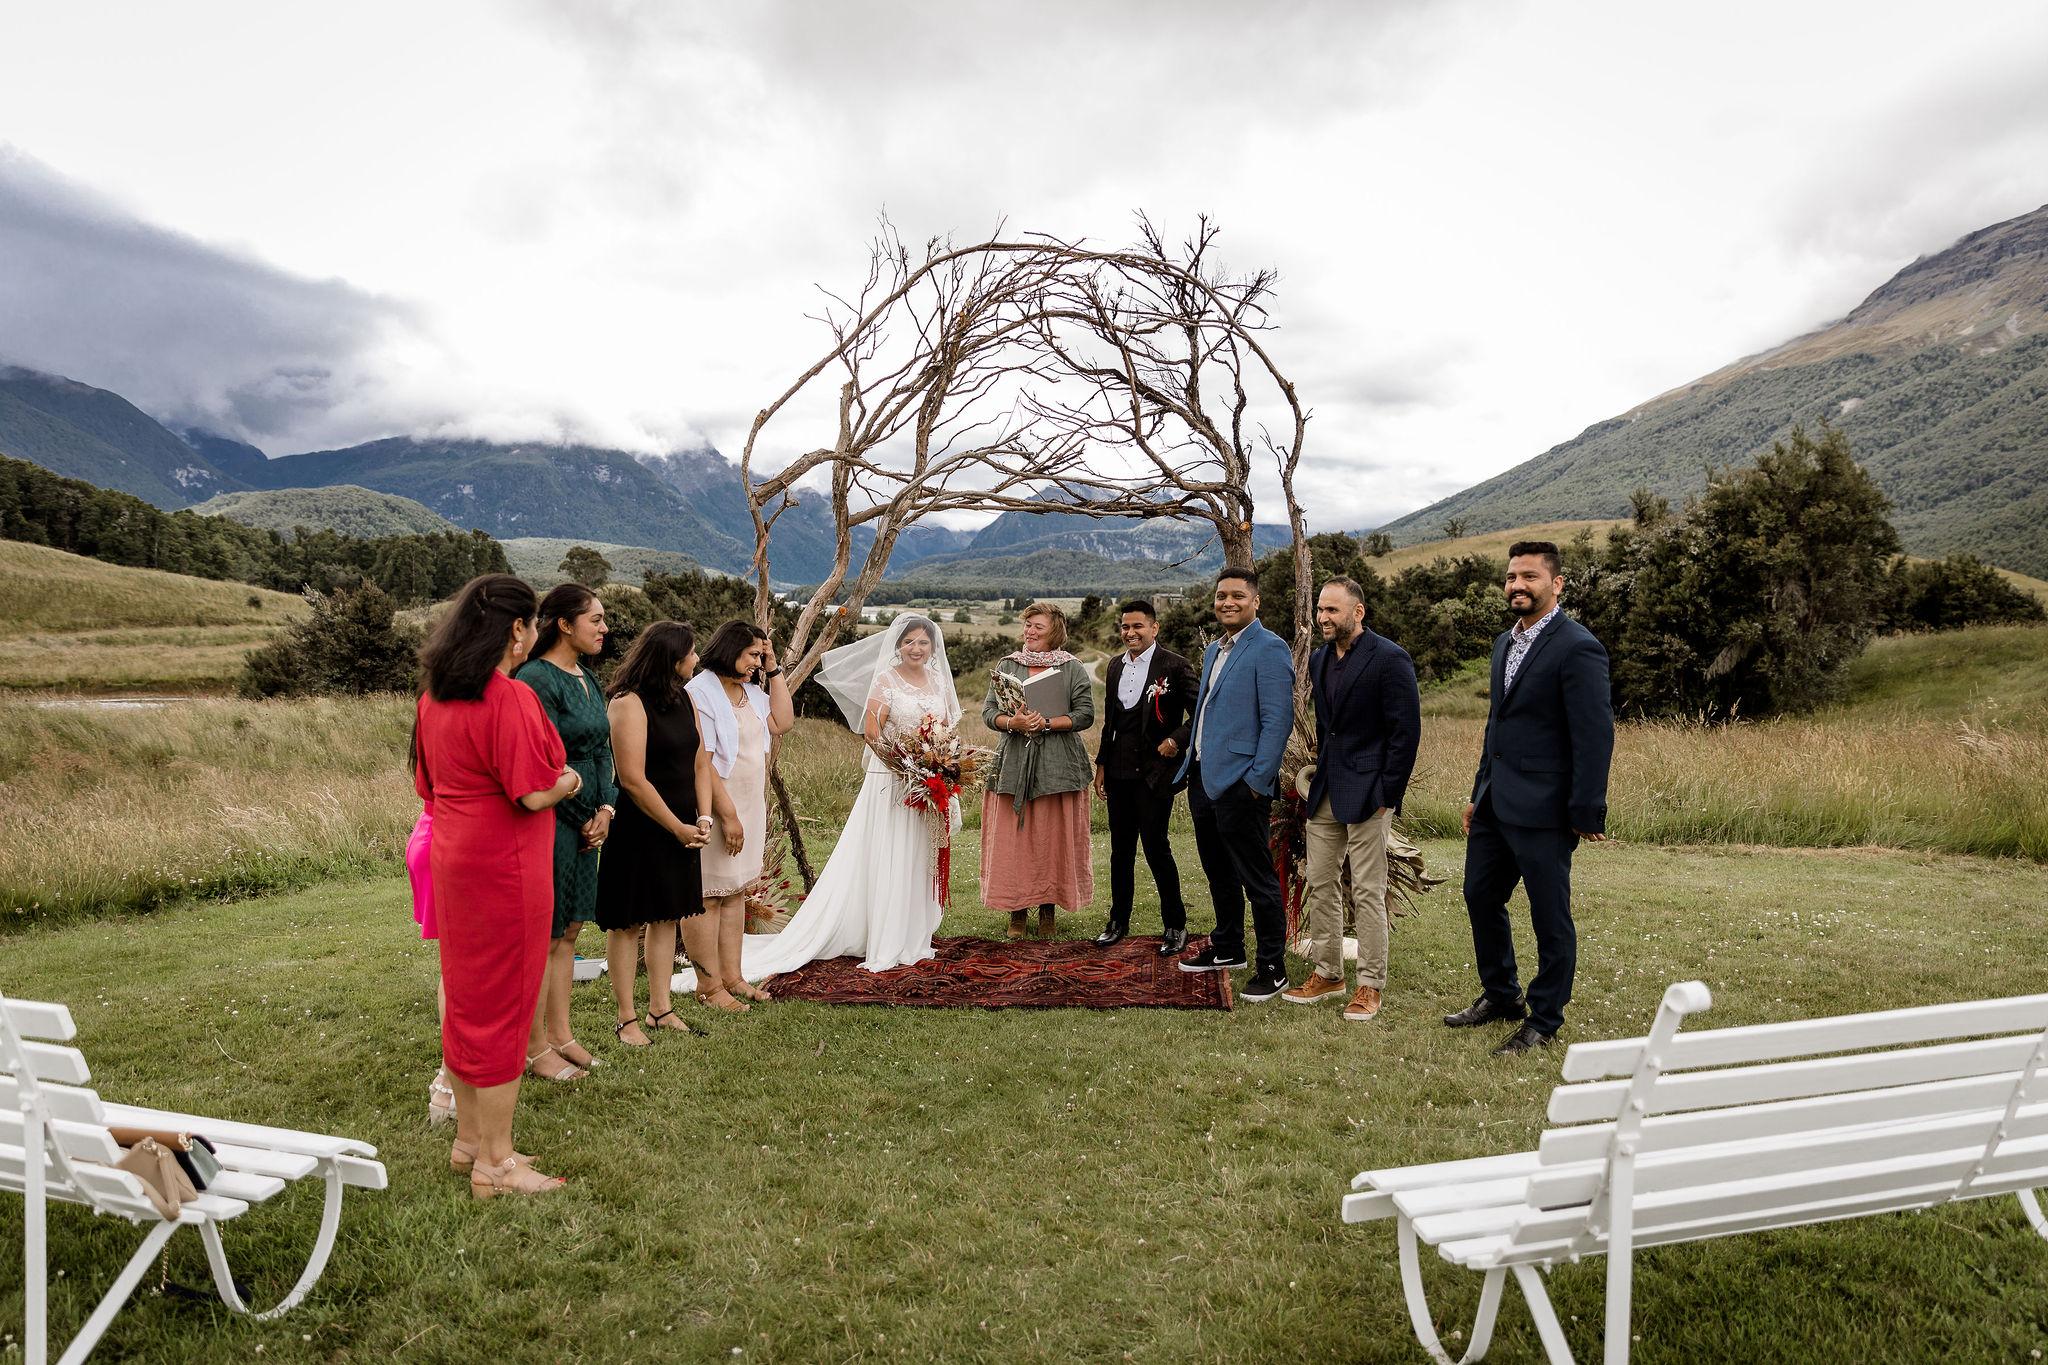 Intimate wedding ceremony - Paradise Trust